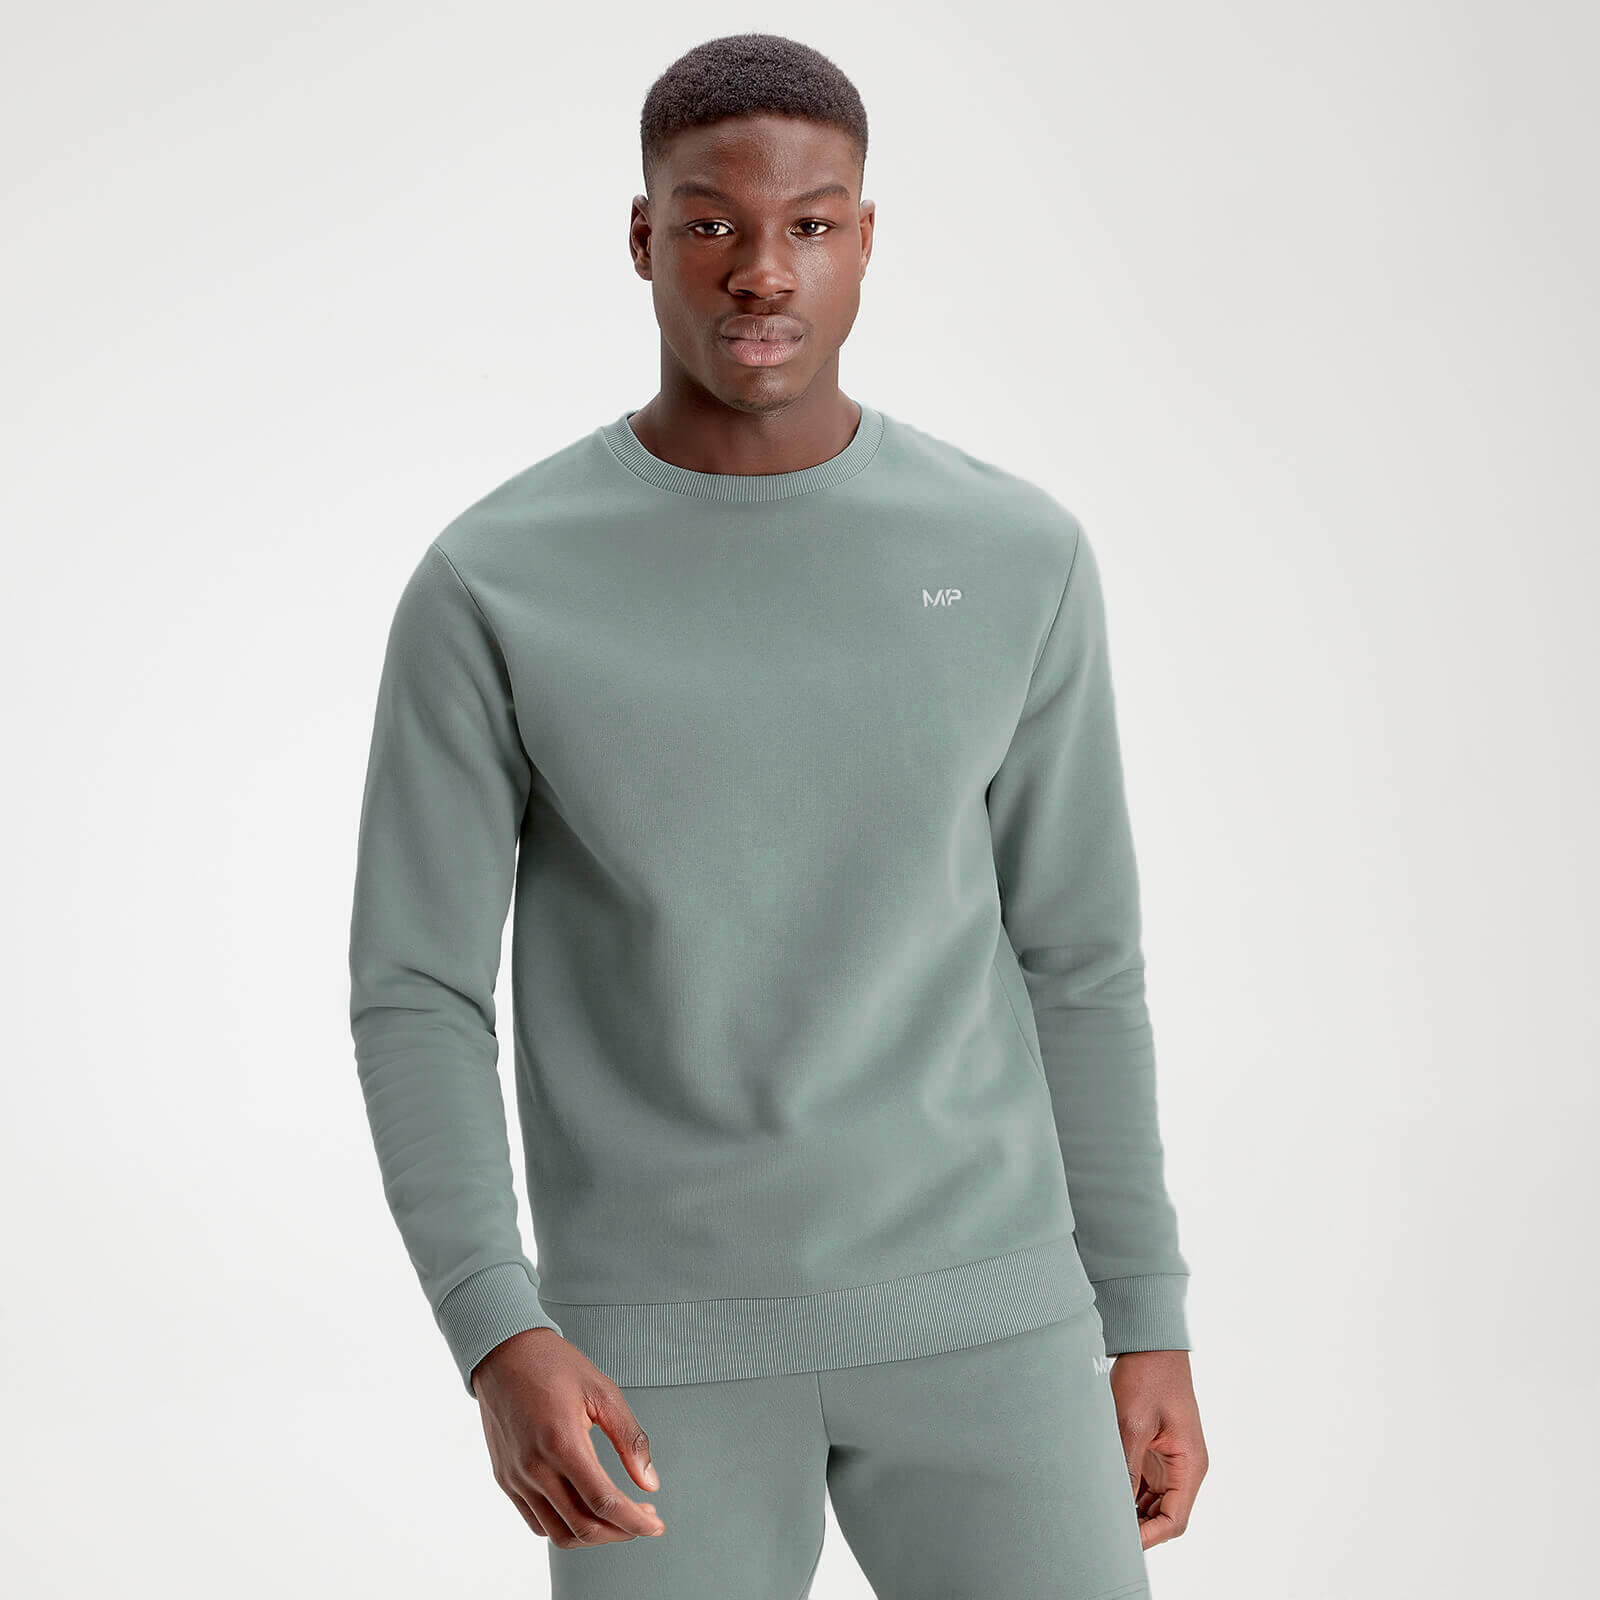 MP Men's Essentials Sweater - Washed Green - XL